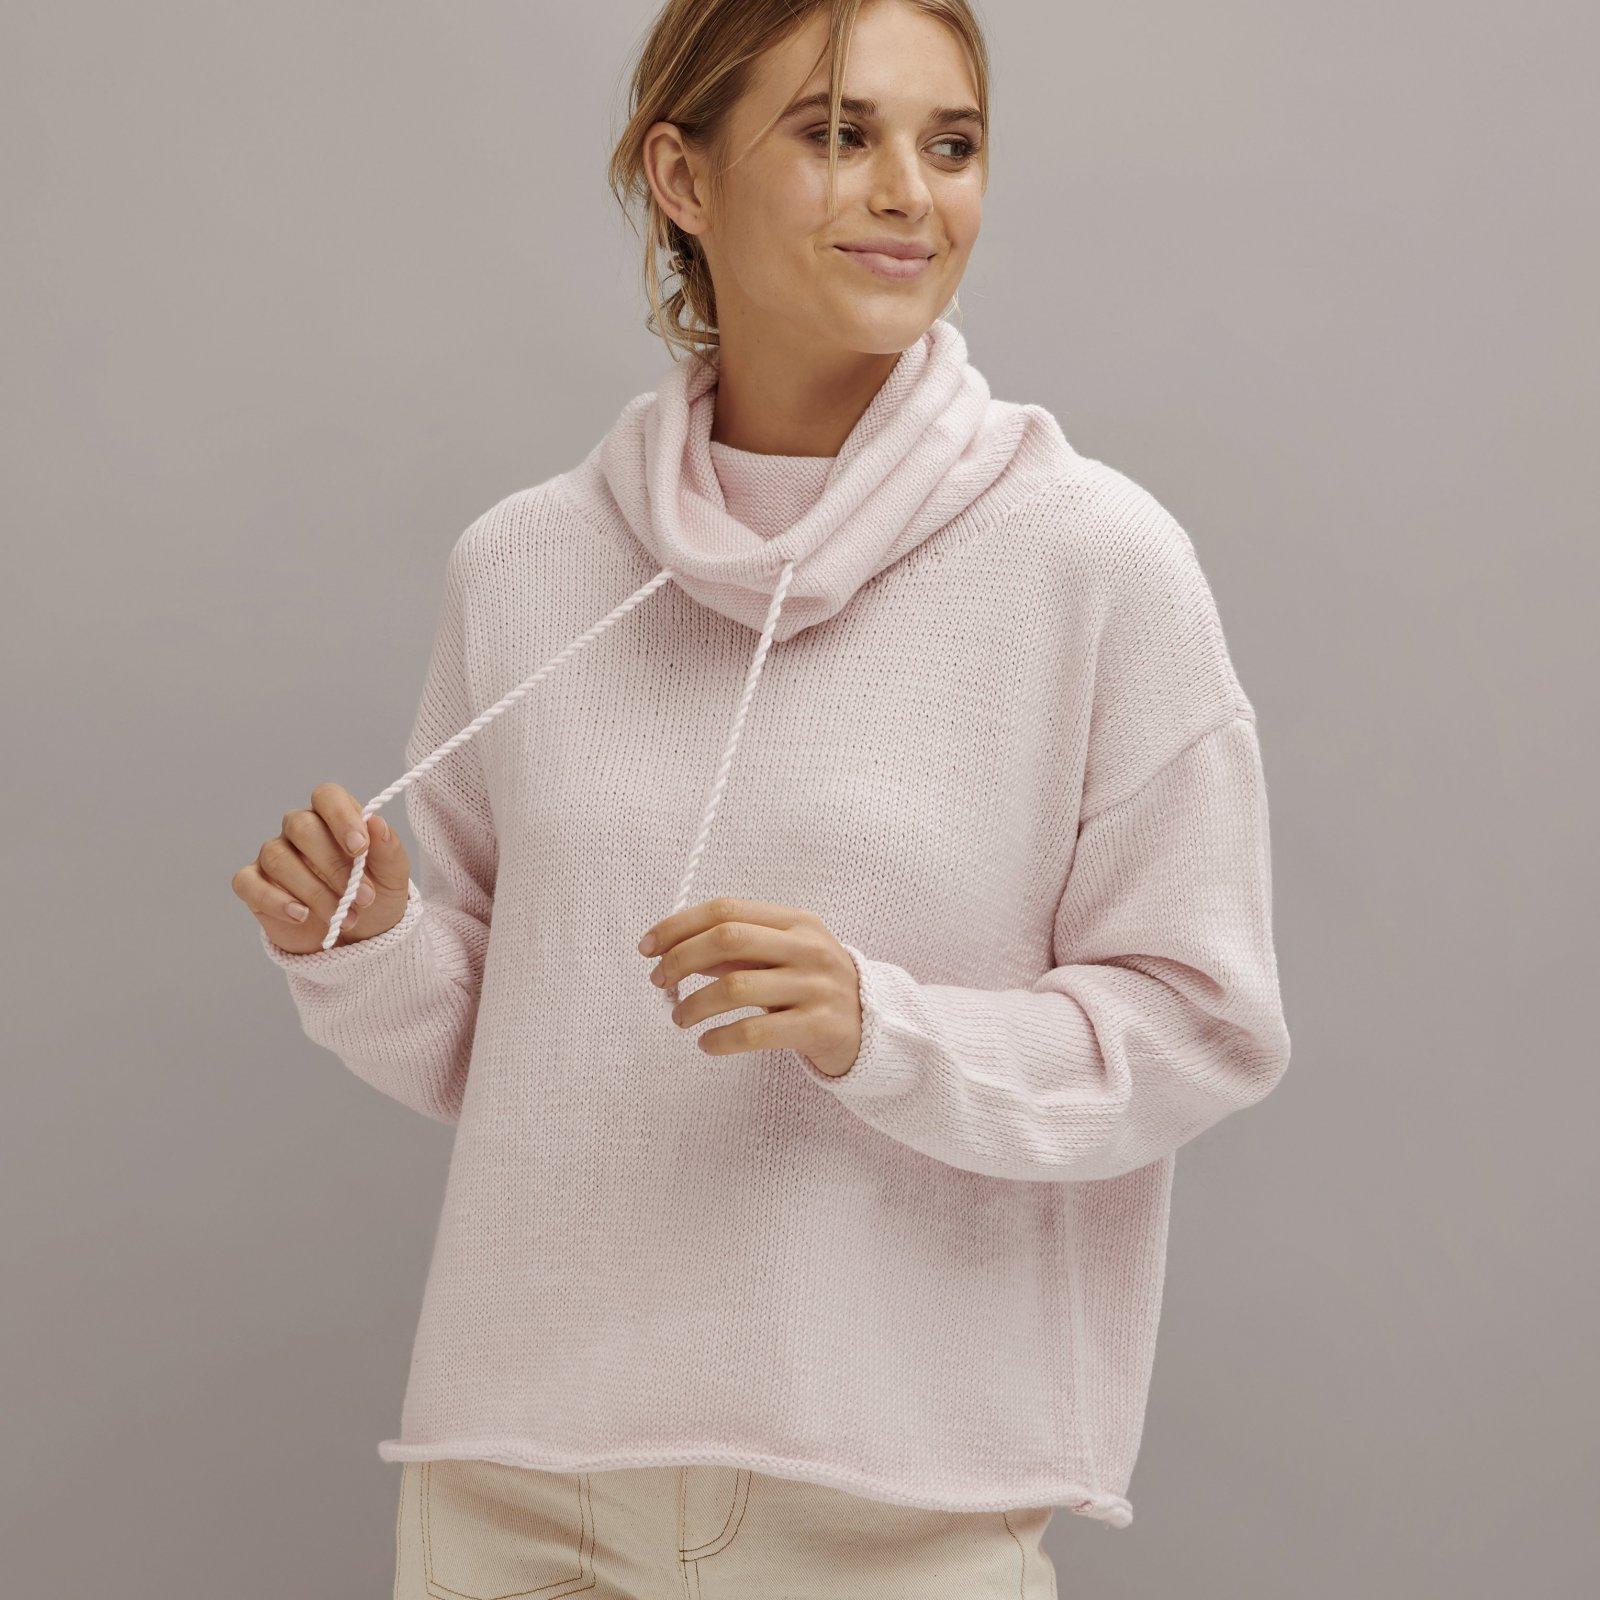 Bellissimo - BOUCHET 788 - Sweater Pattern